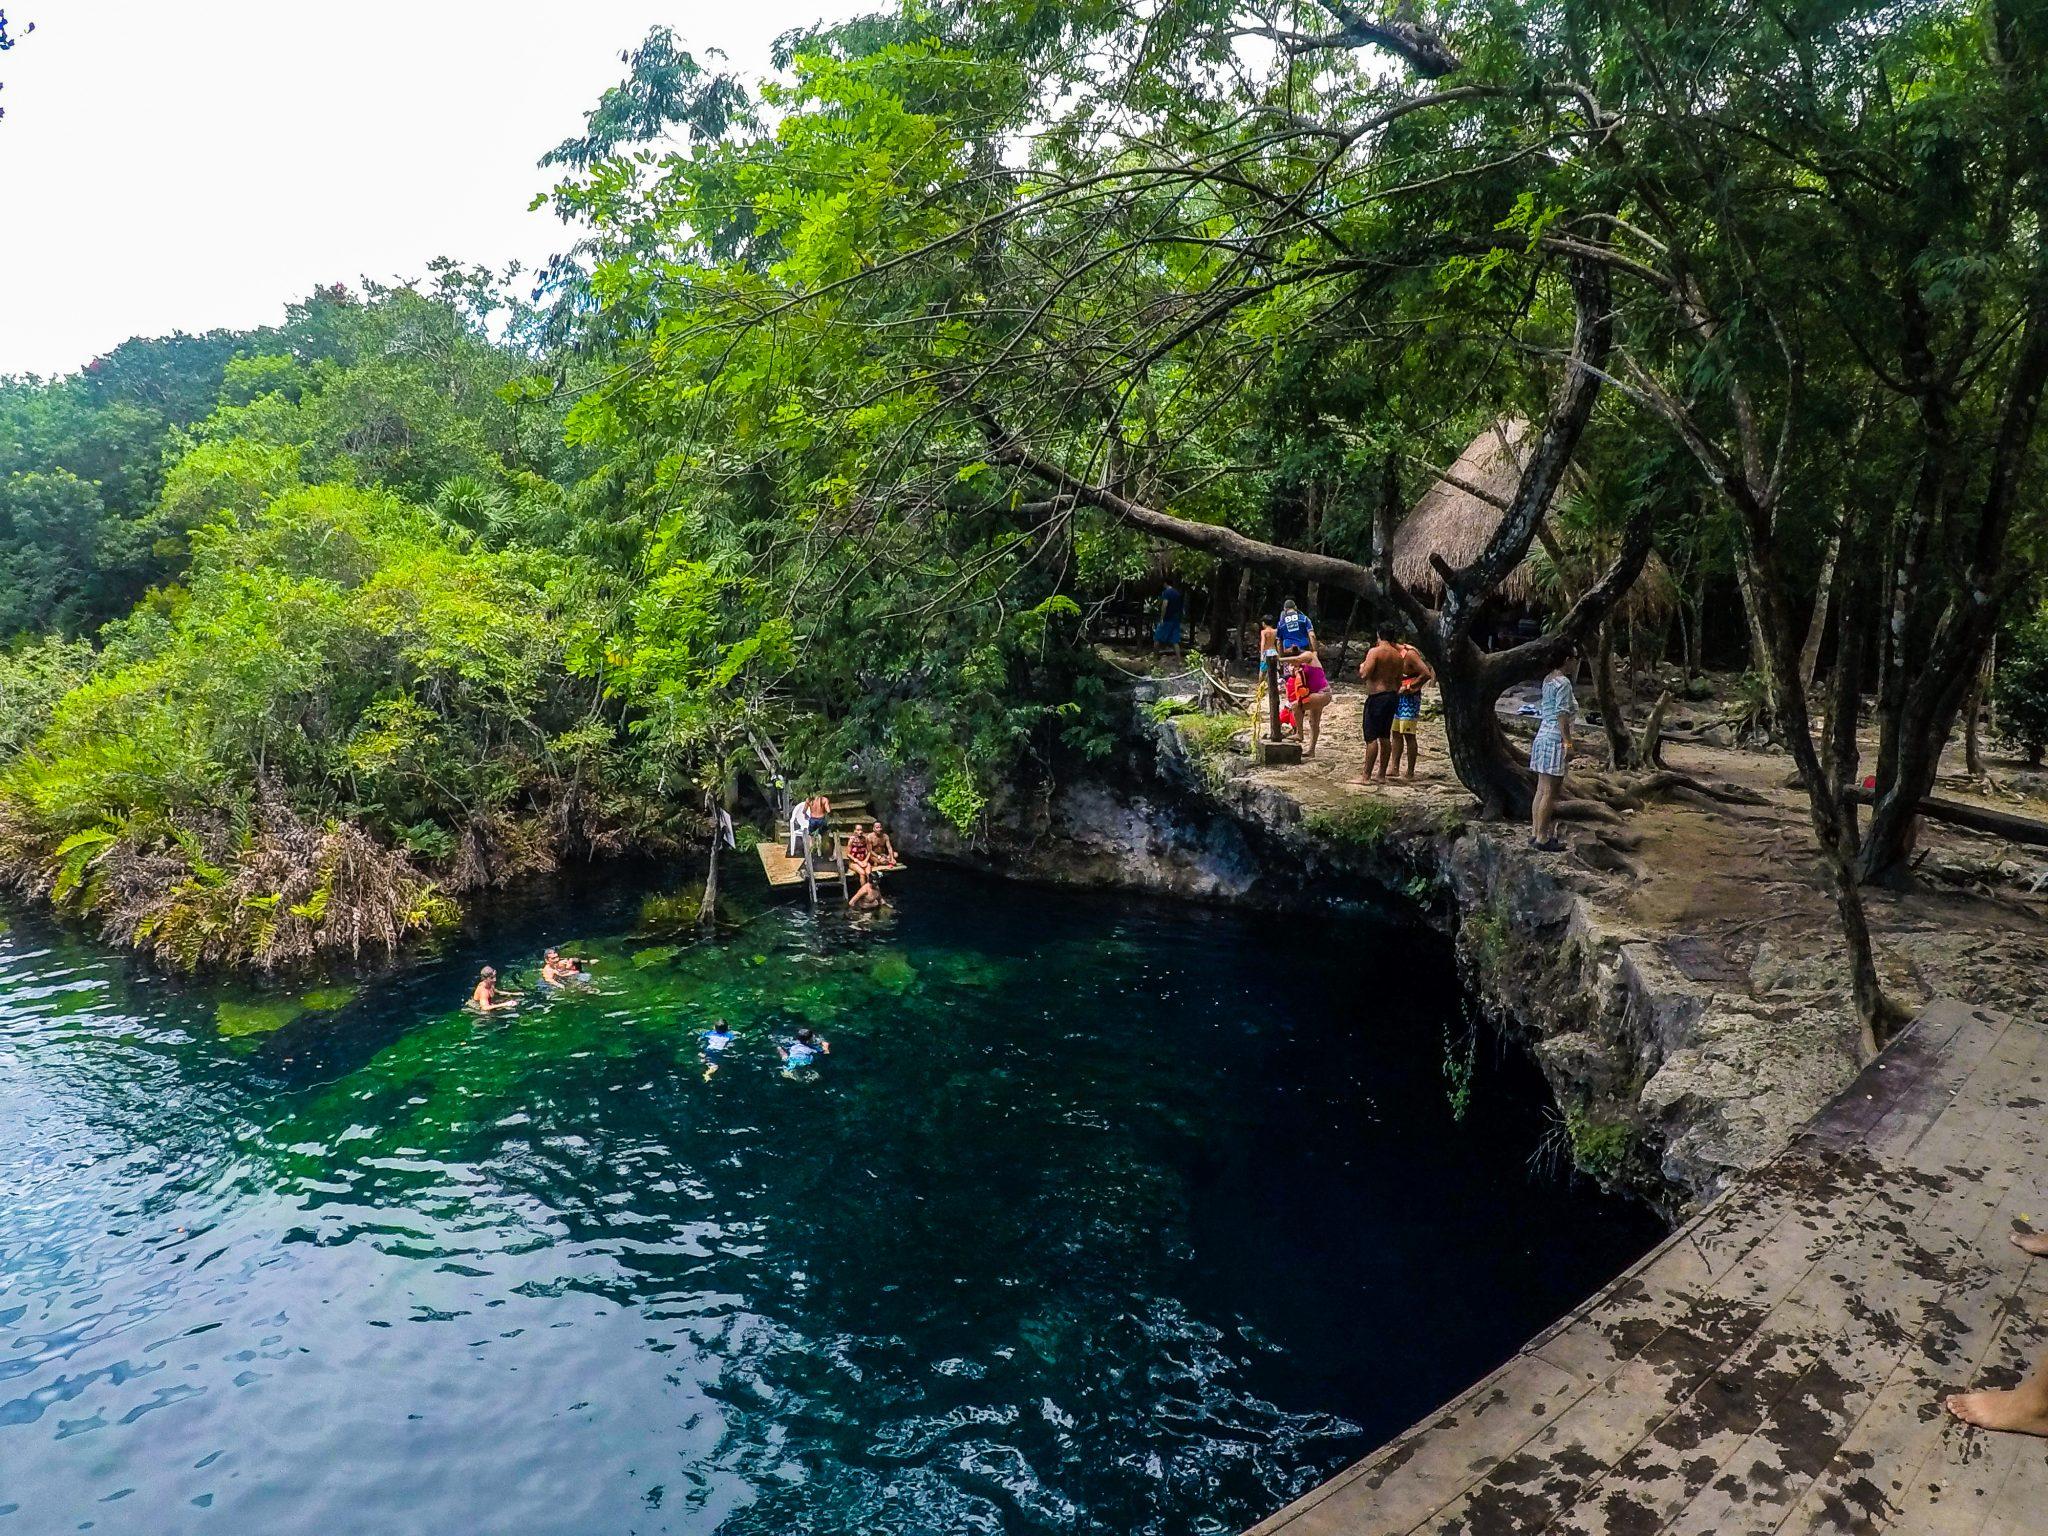 Garden of Eden Cenote